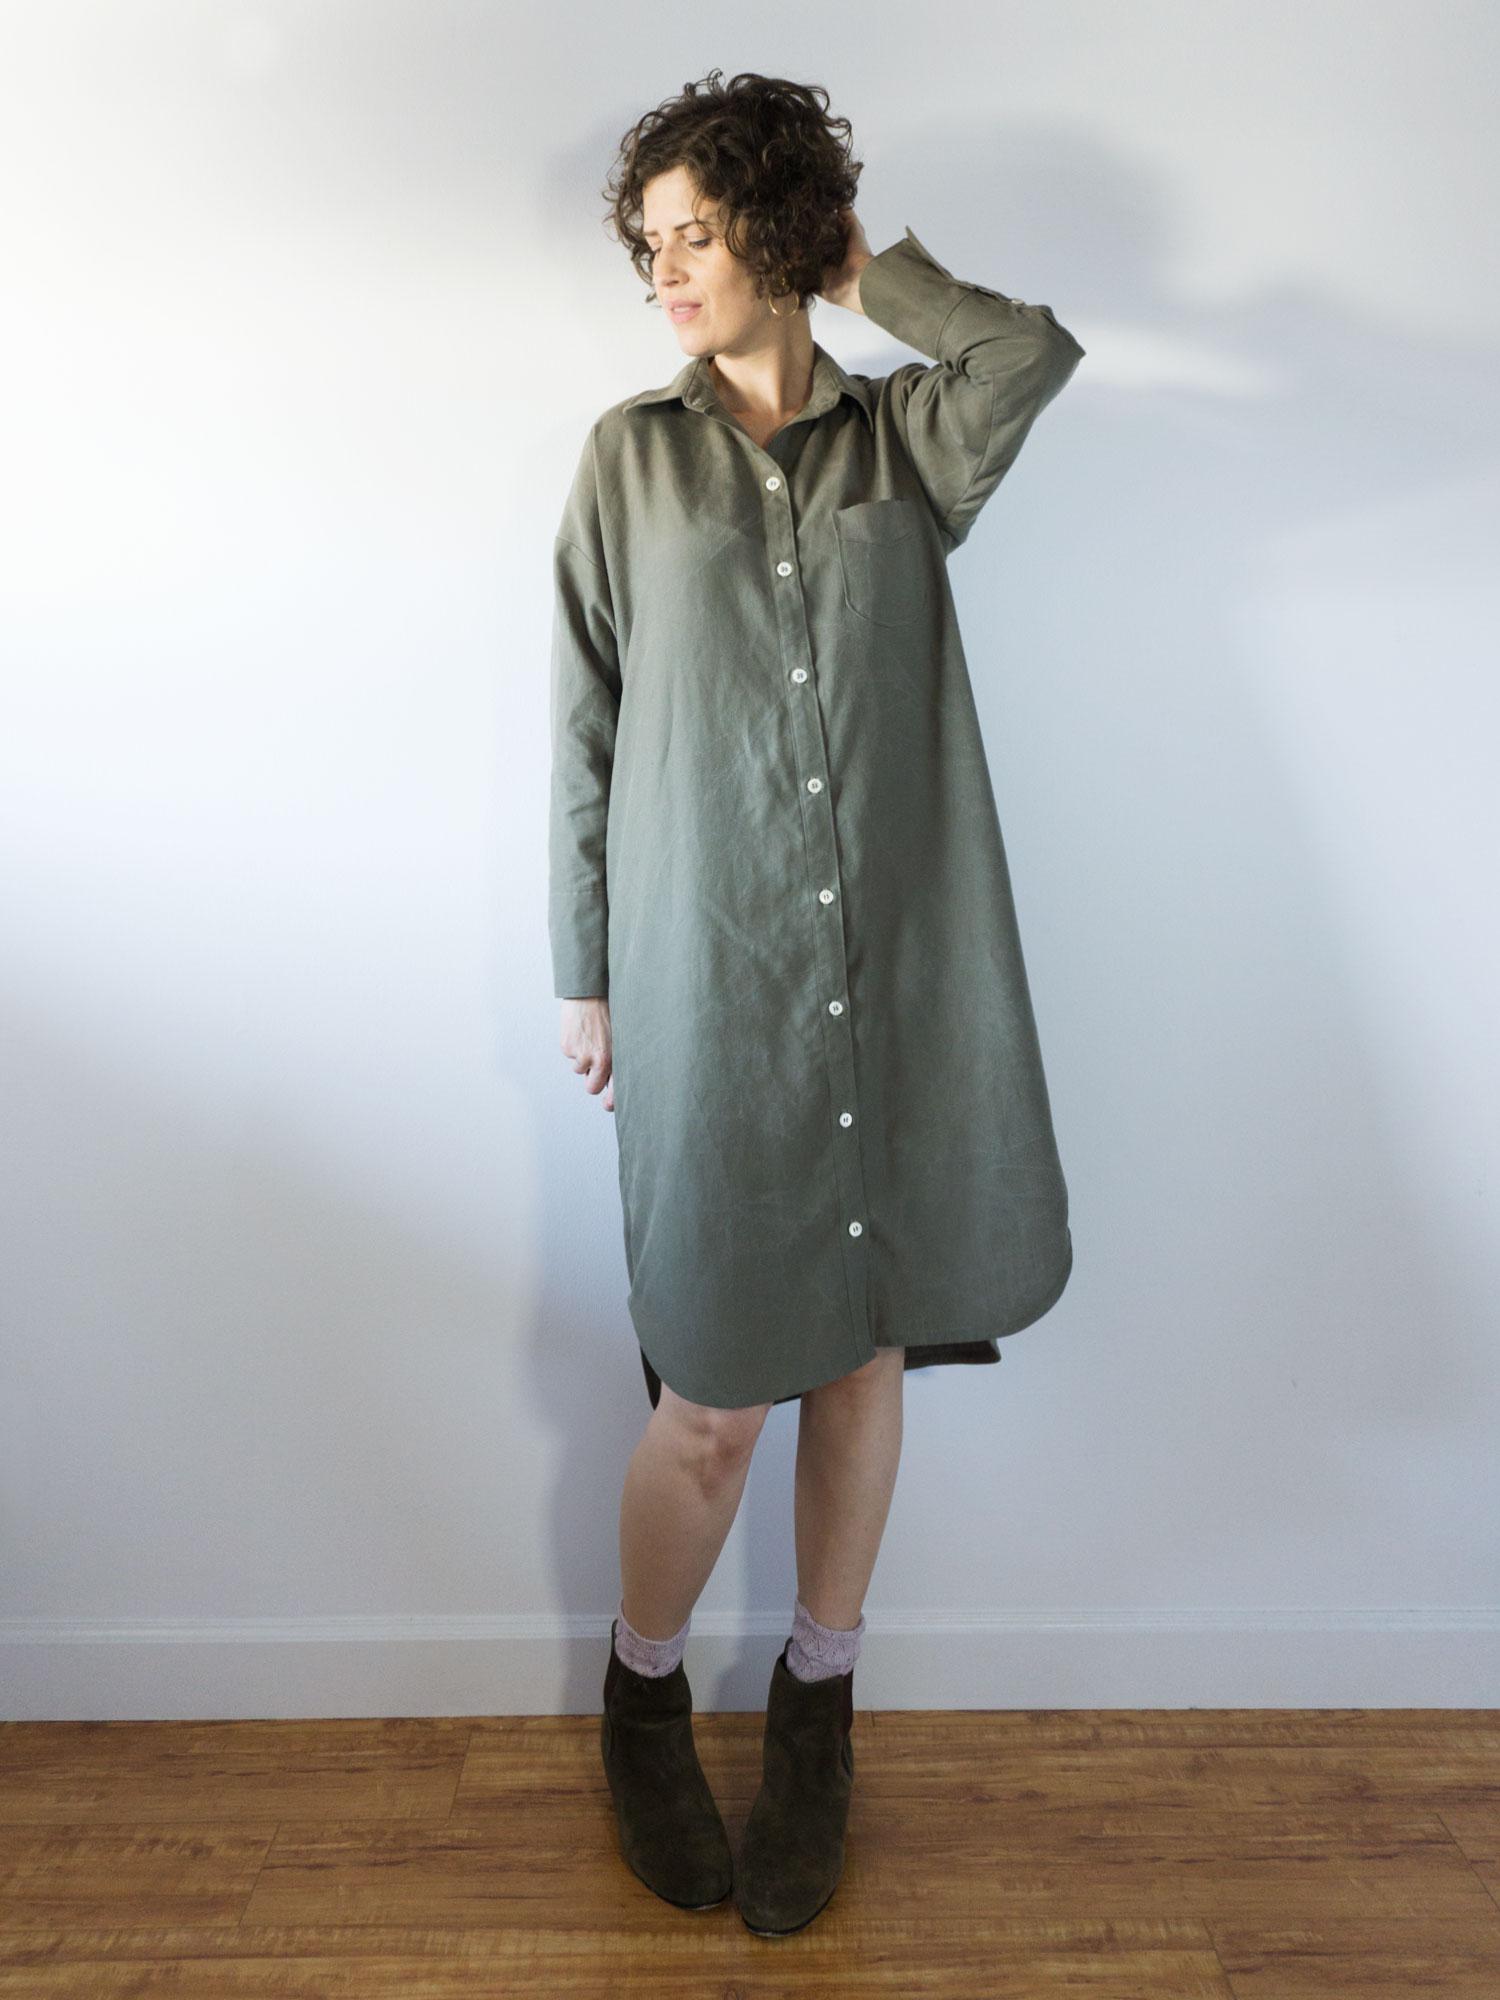 DIY Shirtdress – Review of the Kalle Shirtdress by Closet Case Patterns   Sew DIY